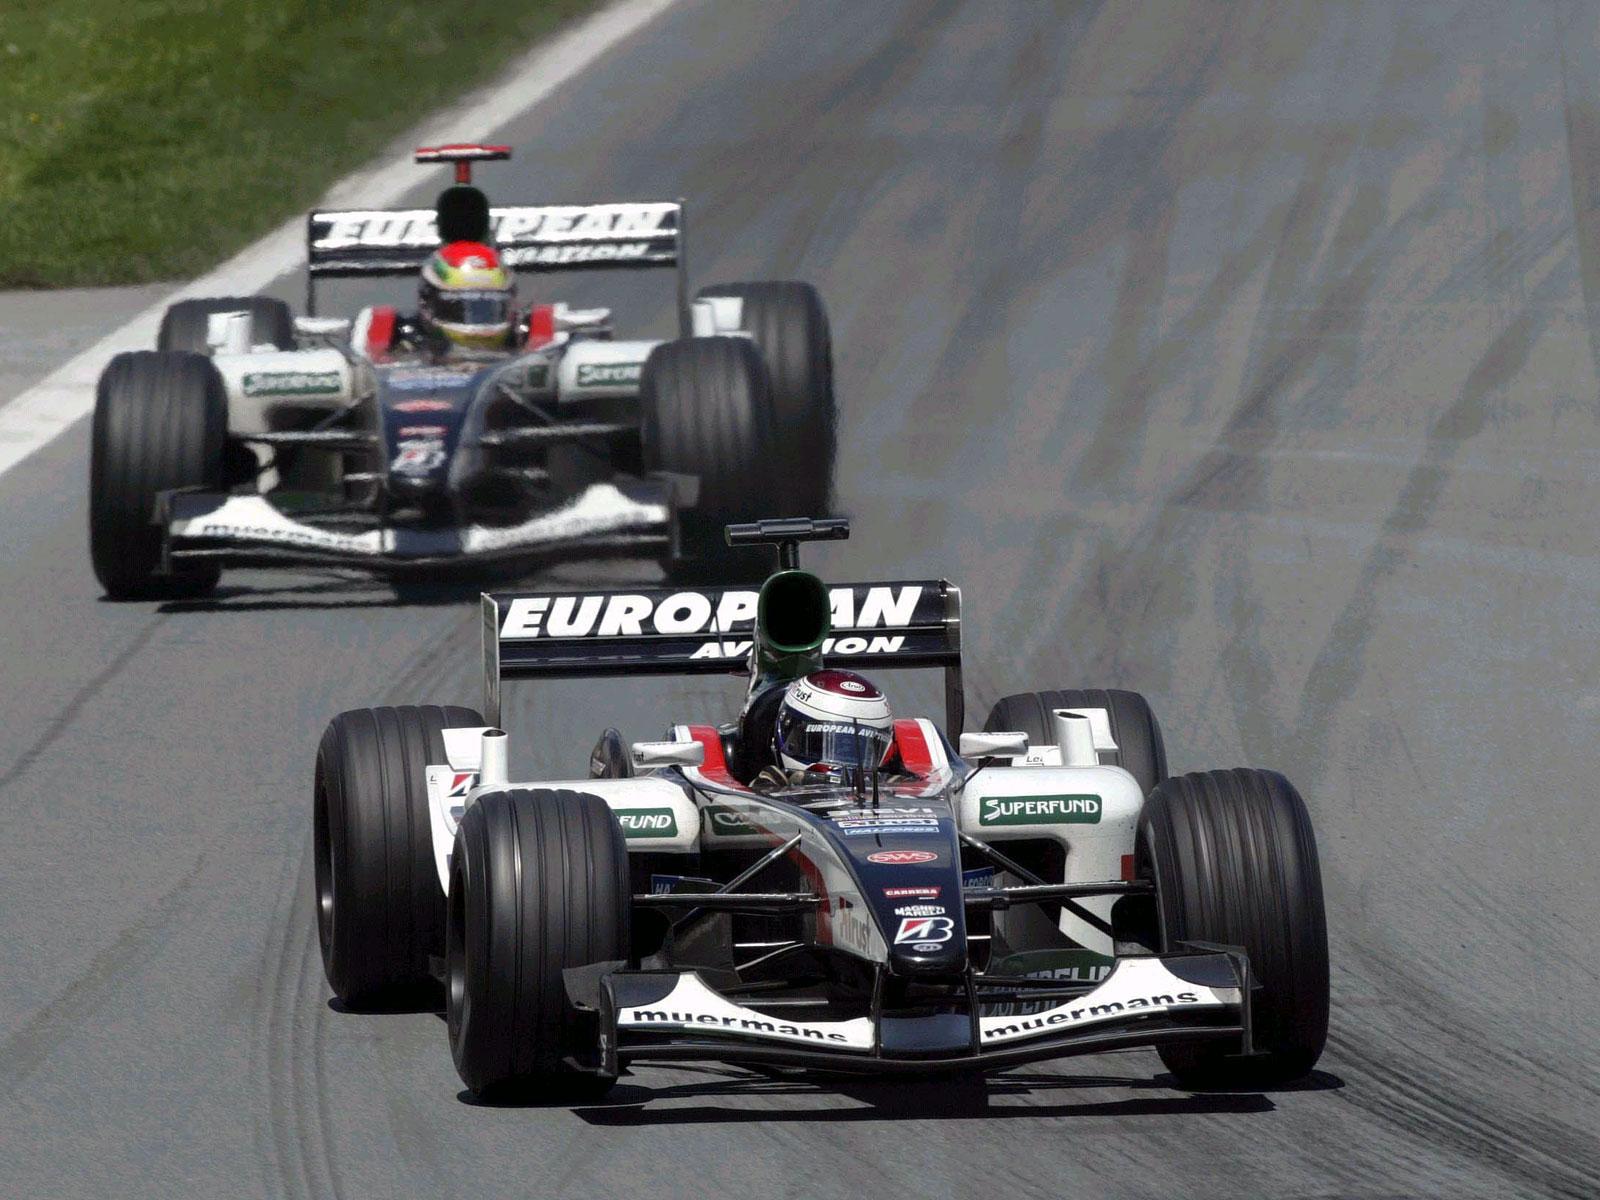 Jos Verstappen, Minardi PS03, 2003 Canadian F1 GP